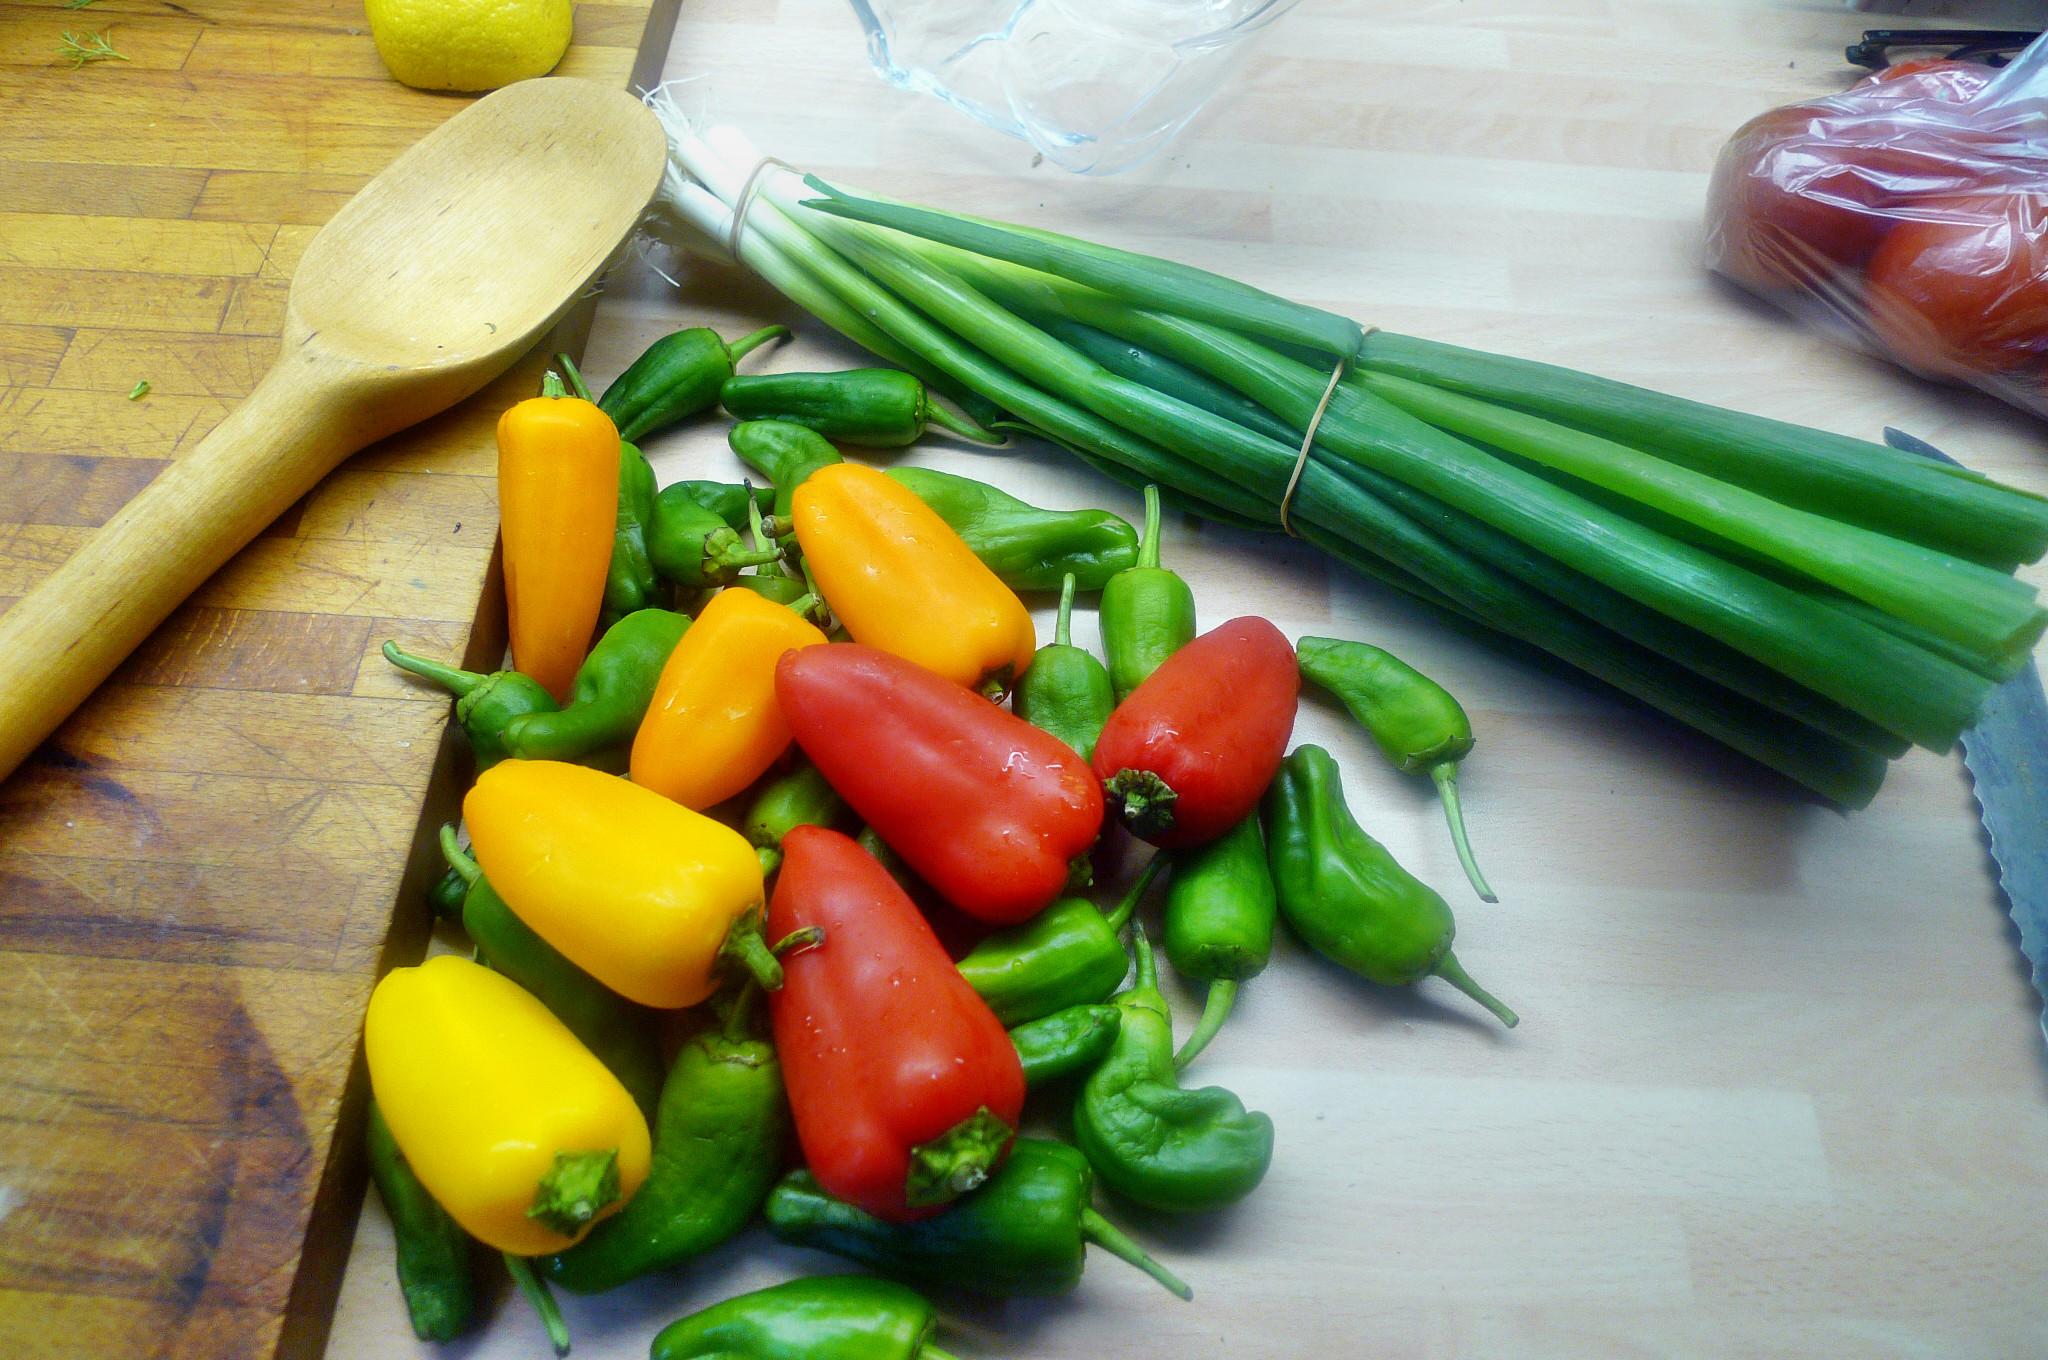 Pimentos-Paprika-Kartoffel-Salat-Buttermilch- 28.9.14   (1)